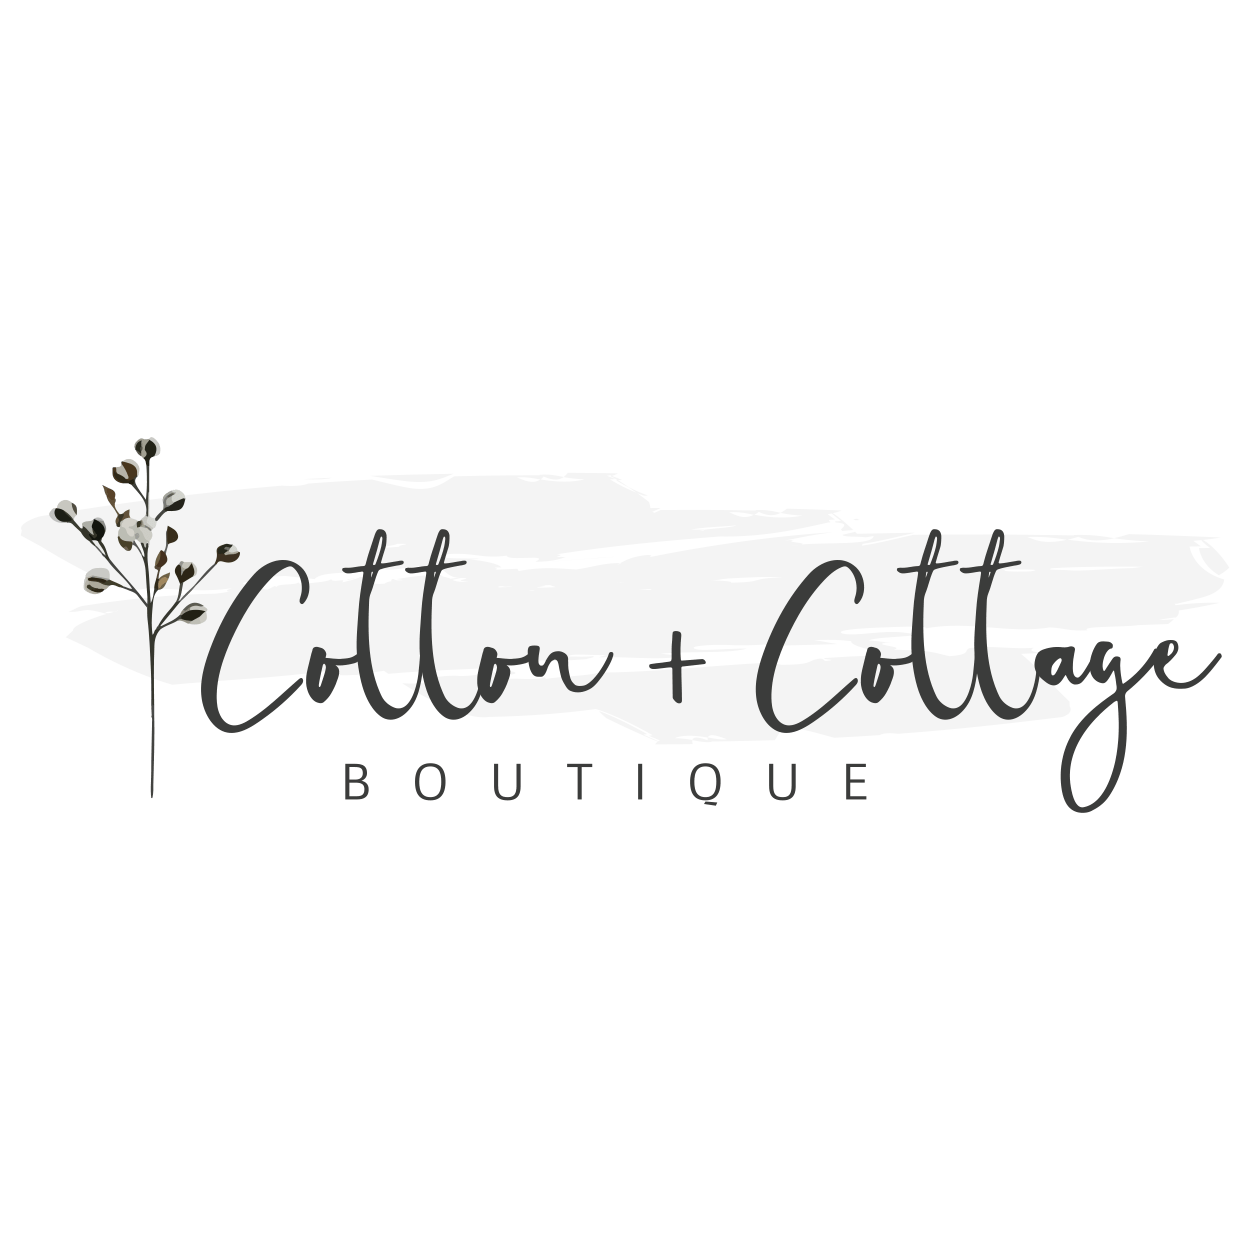 Cotton and Cottage Logo - CottonStemDesignCo - CraftnDraft Inc